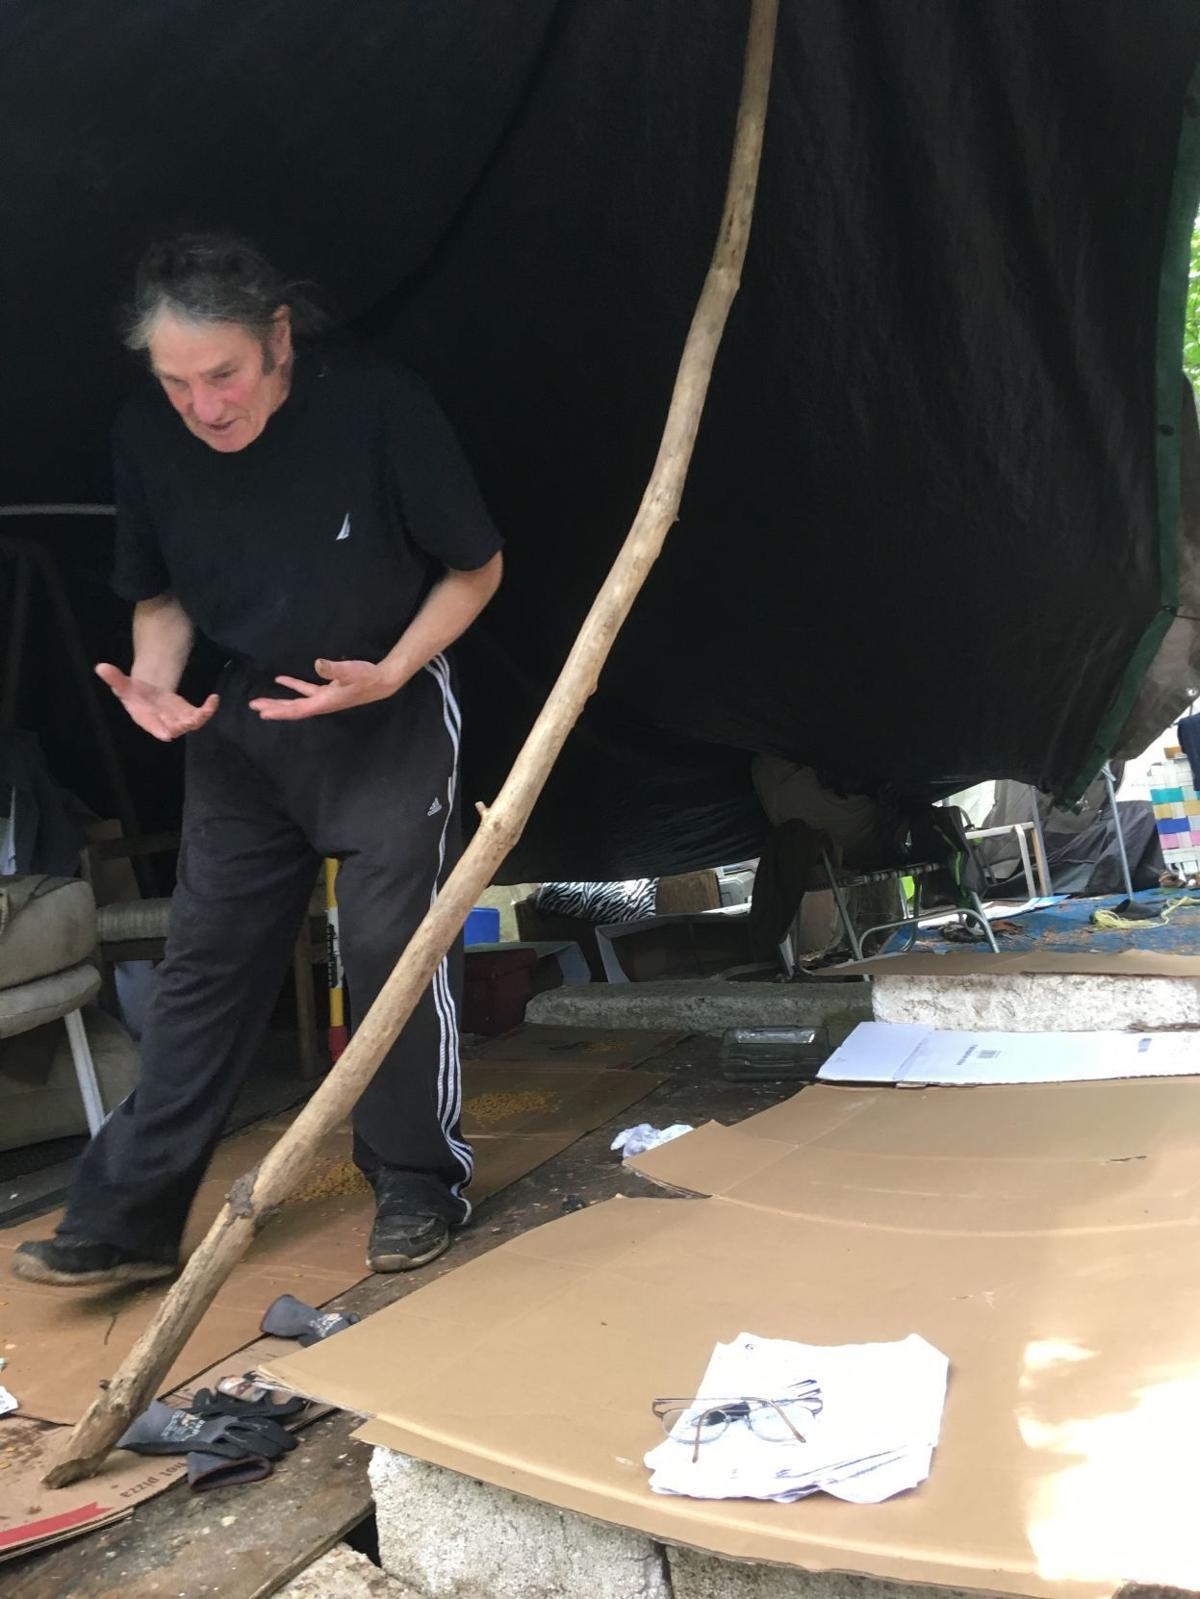 Burdo under tarp